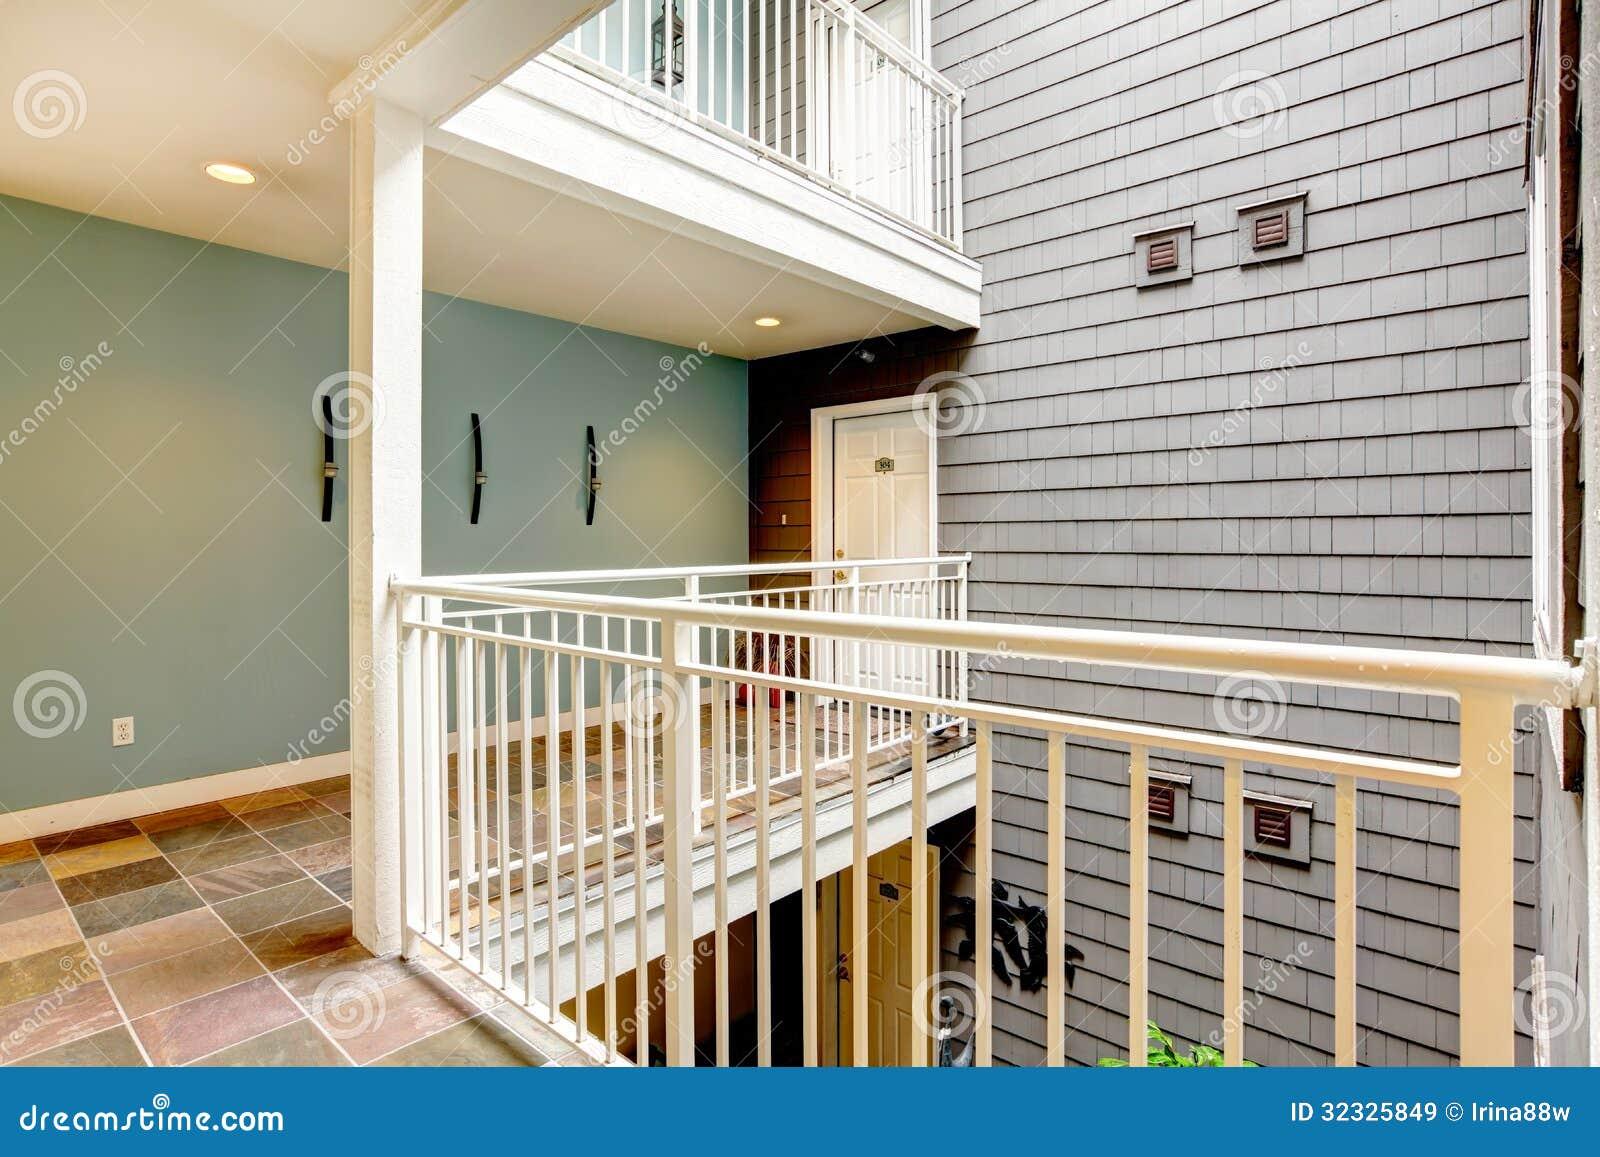 Simple Apartment Building Hallway Blue Door Paris Pinterest